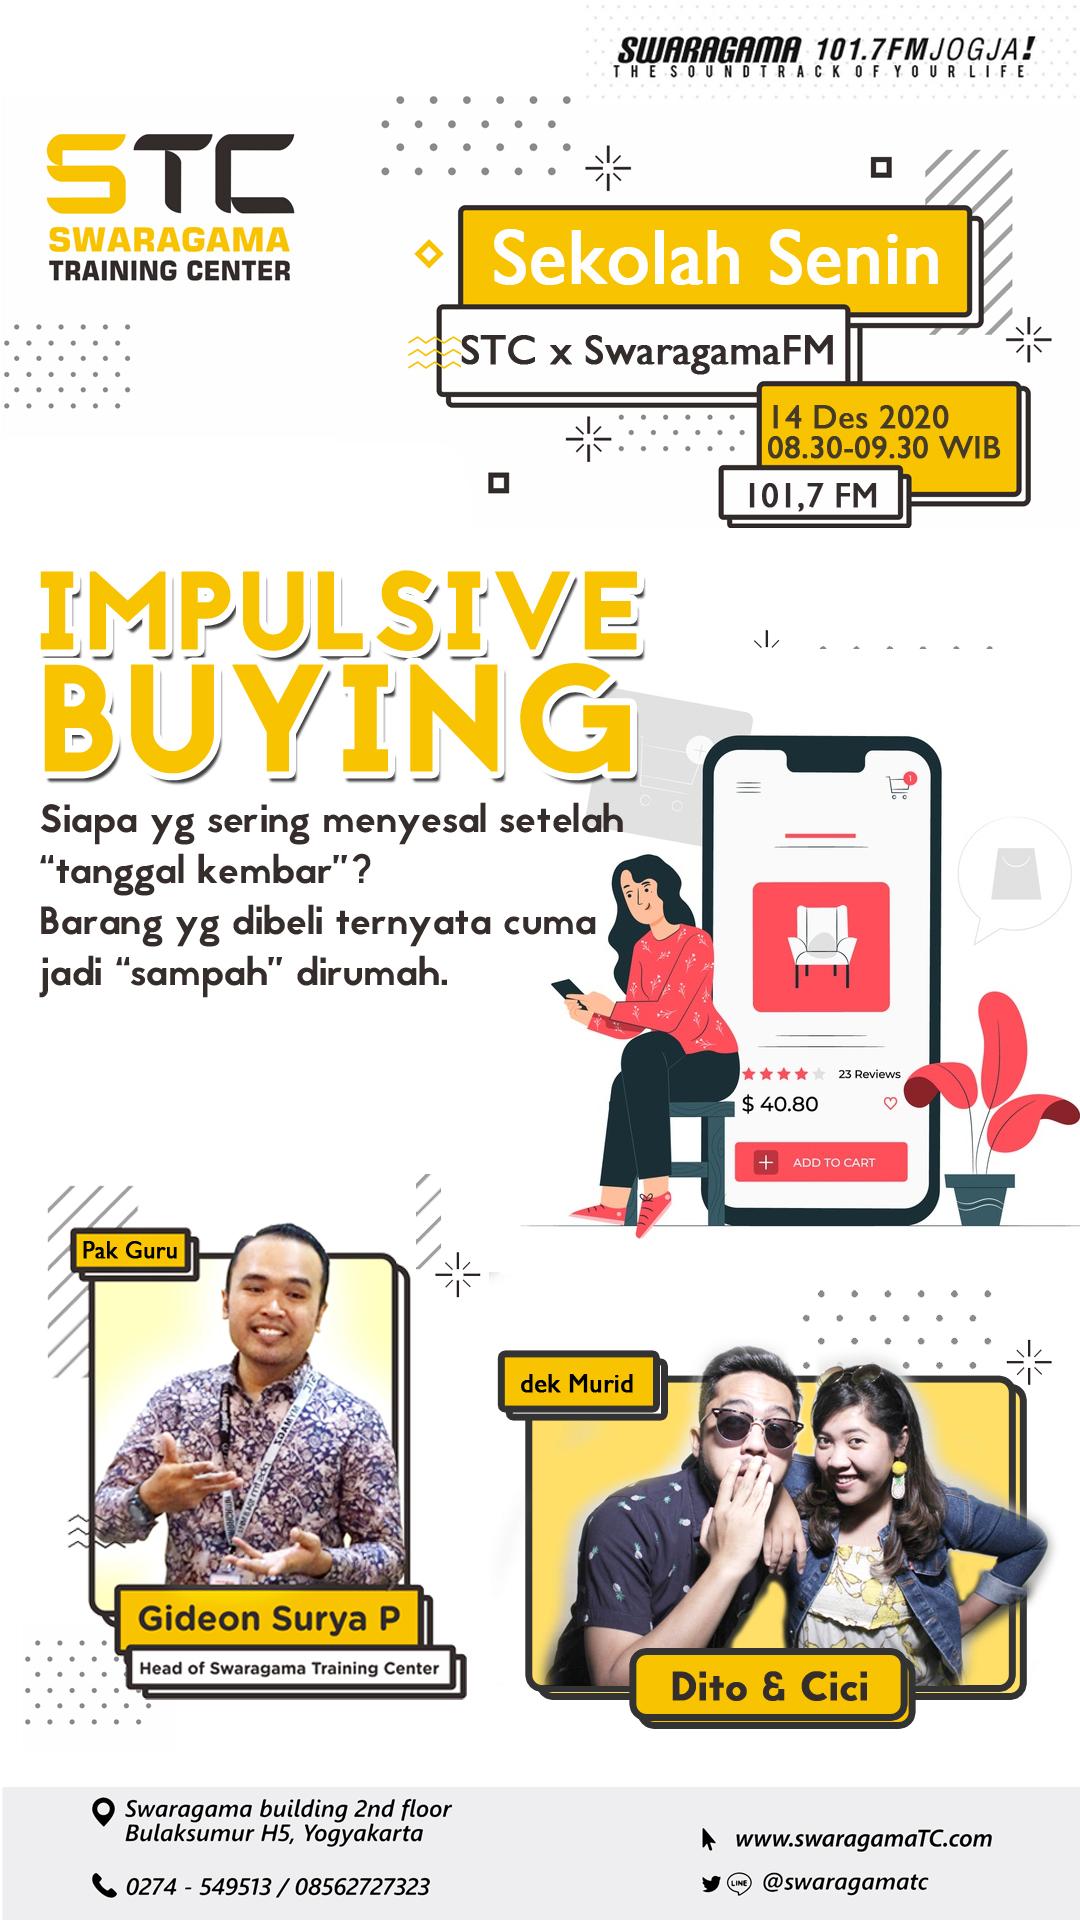 Impulsive Buying (gimana cara mengendalikannya) – Sekolah Senin 14 Desember 2020